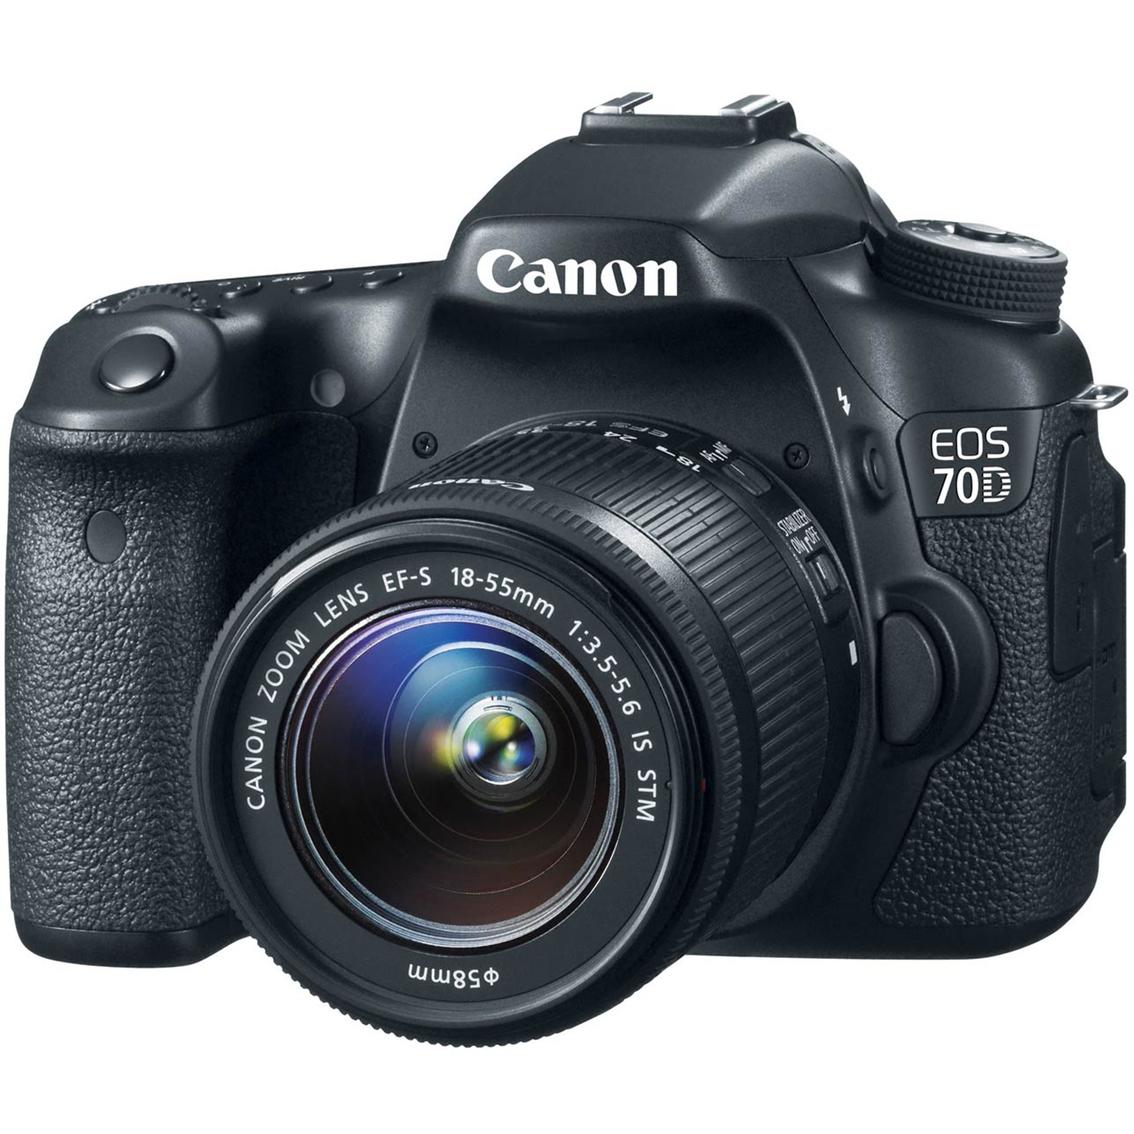 Camera Canon Dslr Camera 70d canon eos 70d 20 2mp dslr camera with ef s 18 55mm image cameras 1007